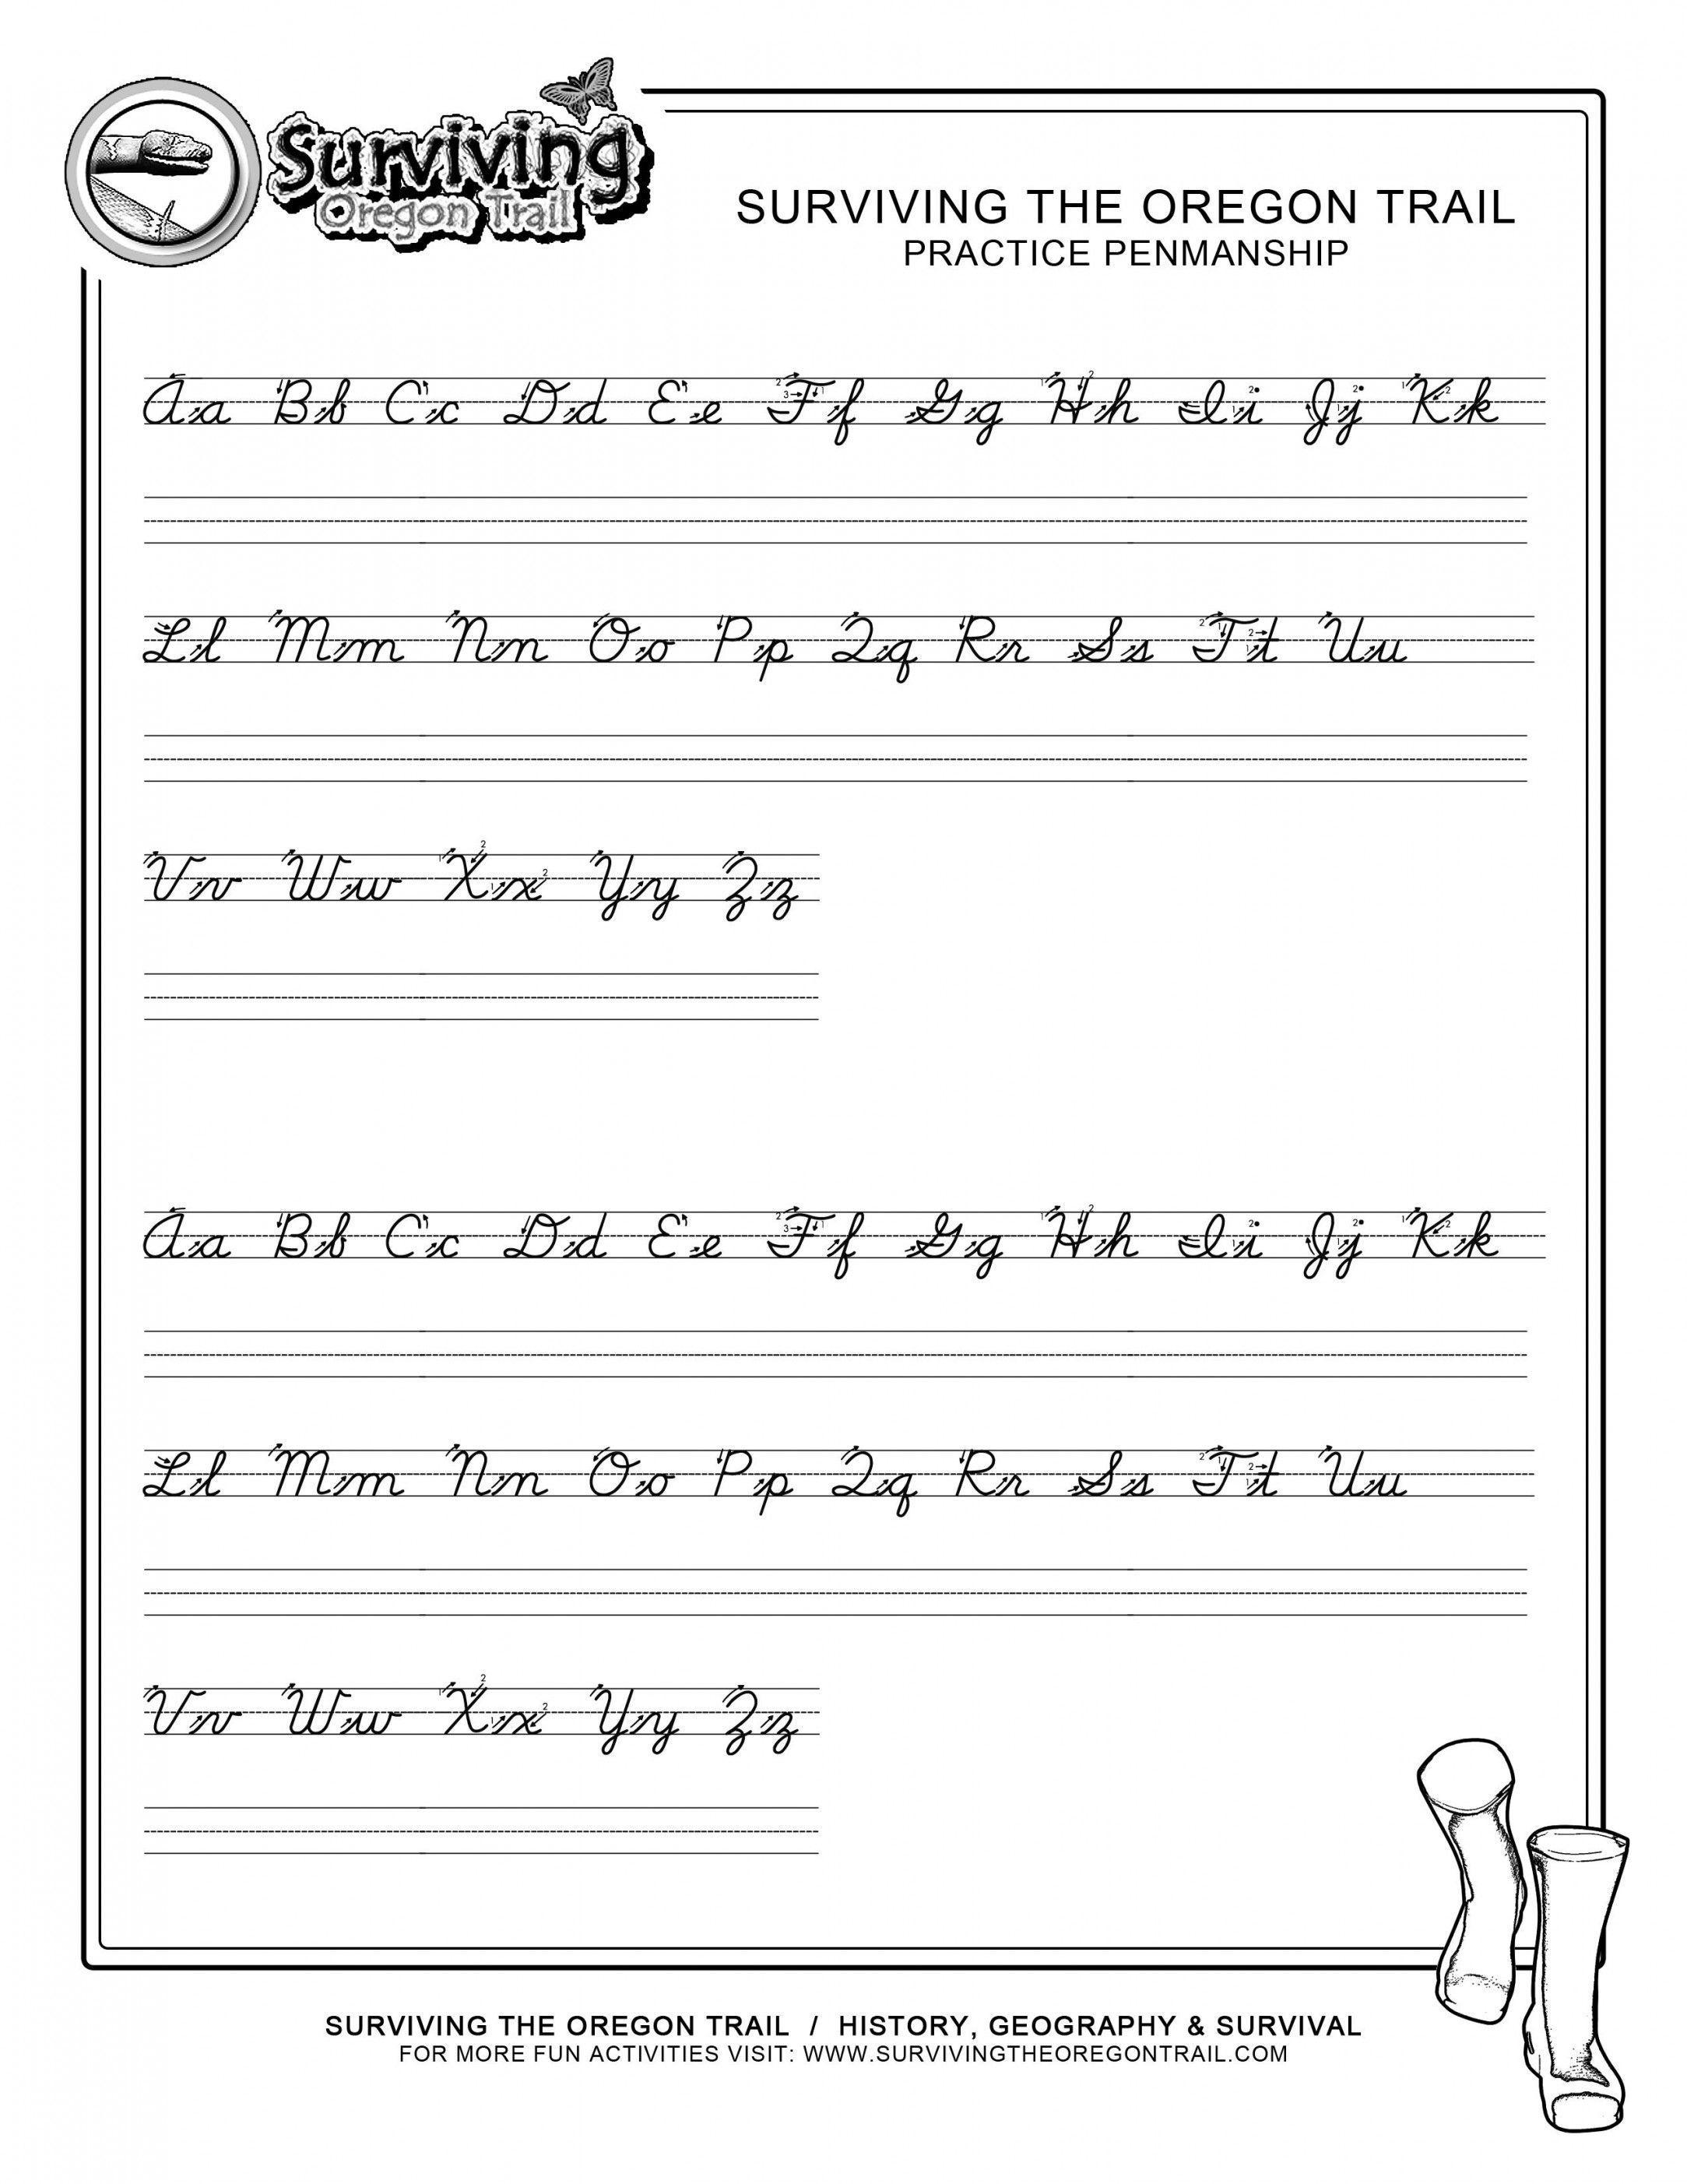 Free Printable Cursive Handwriting Worksheets | Lostranquillos - Free Printable Cursive Practice